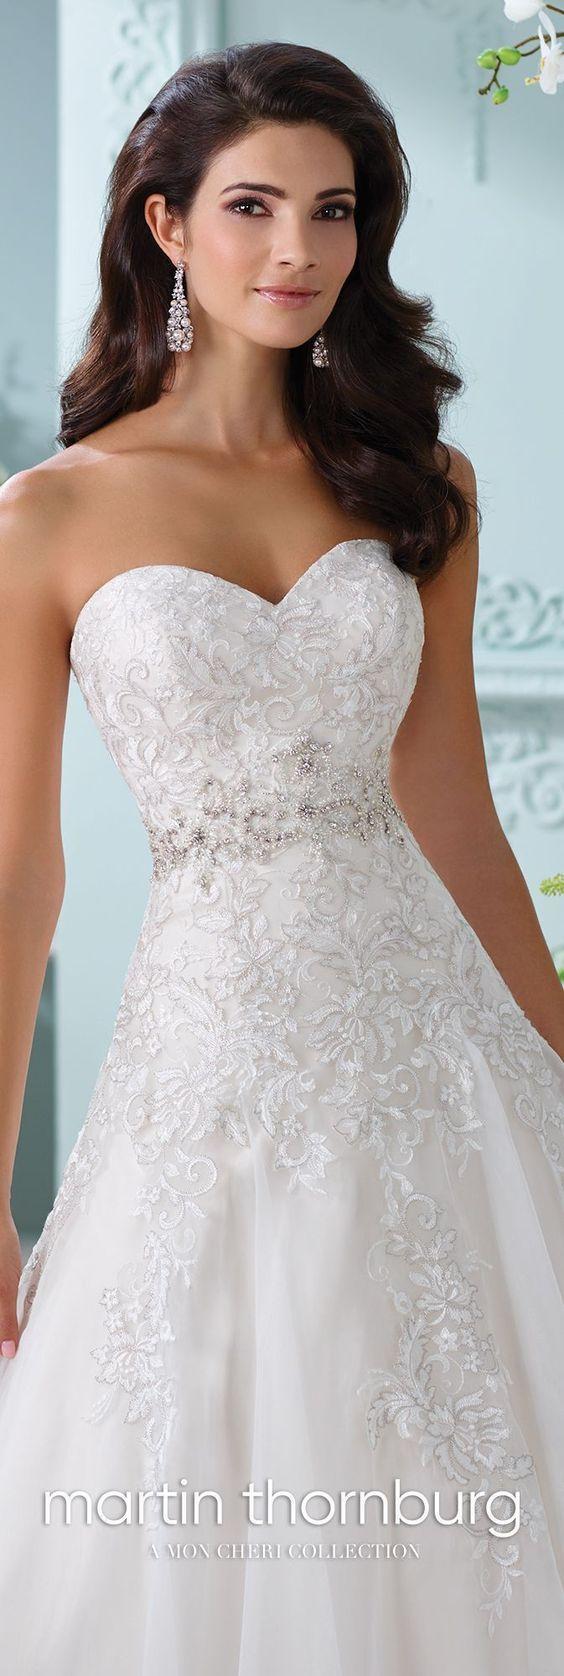 1302 best Brautkleider / Wedding Dresses images on Pinterest ...